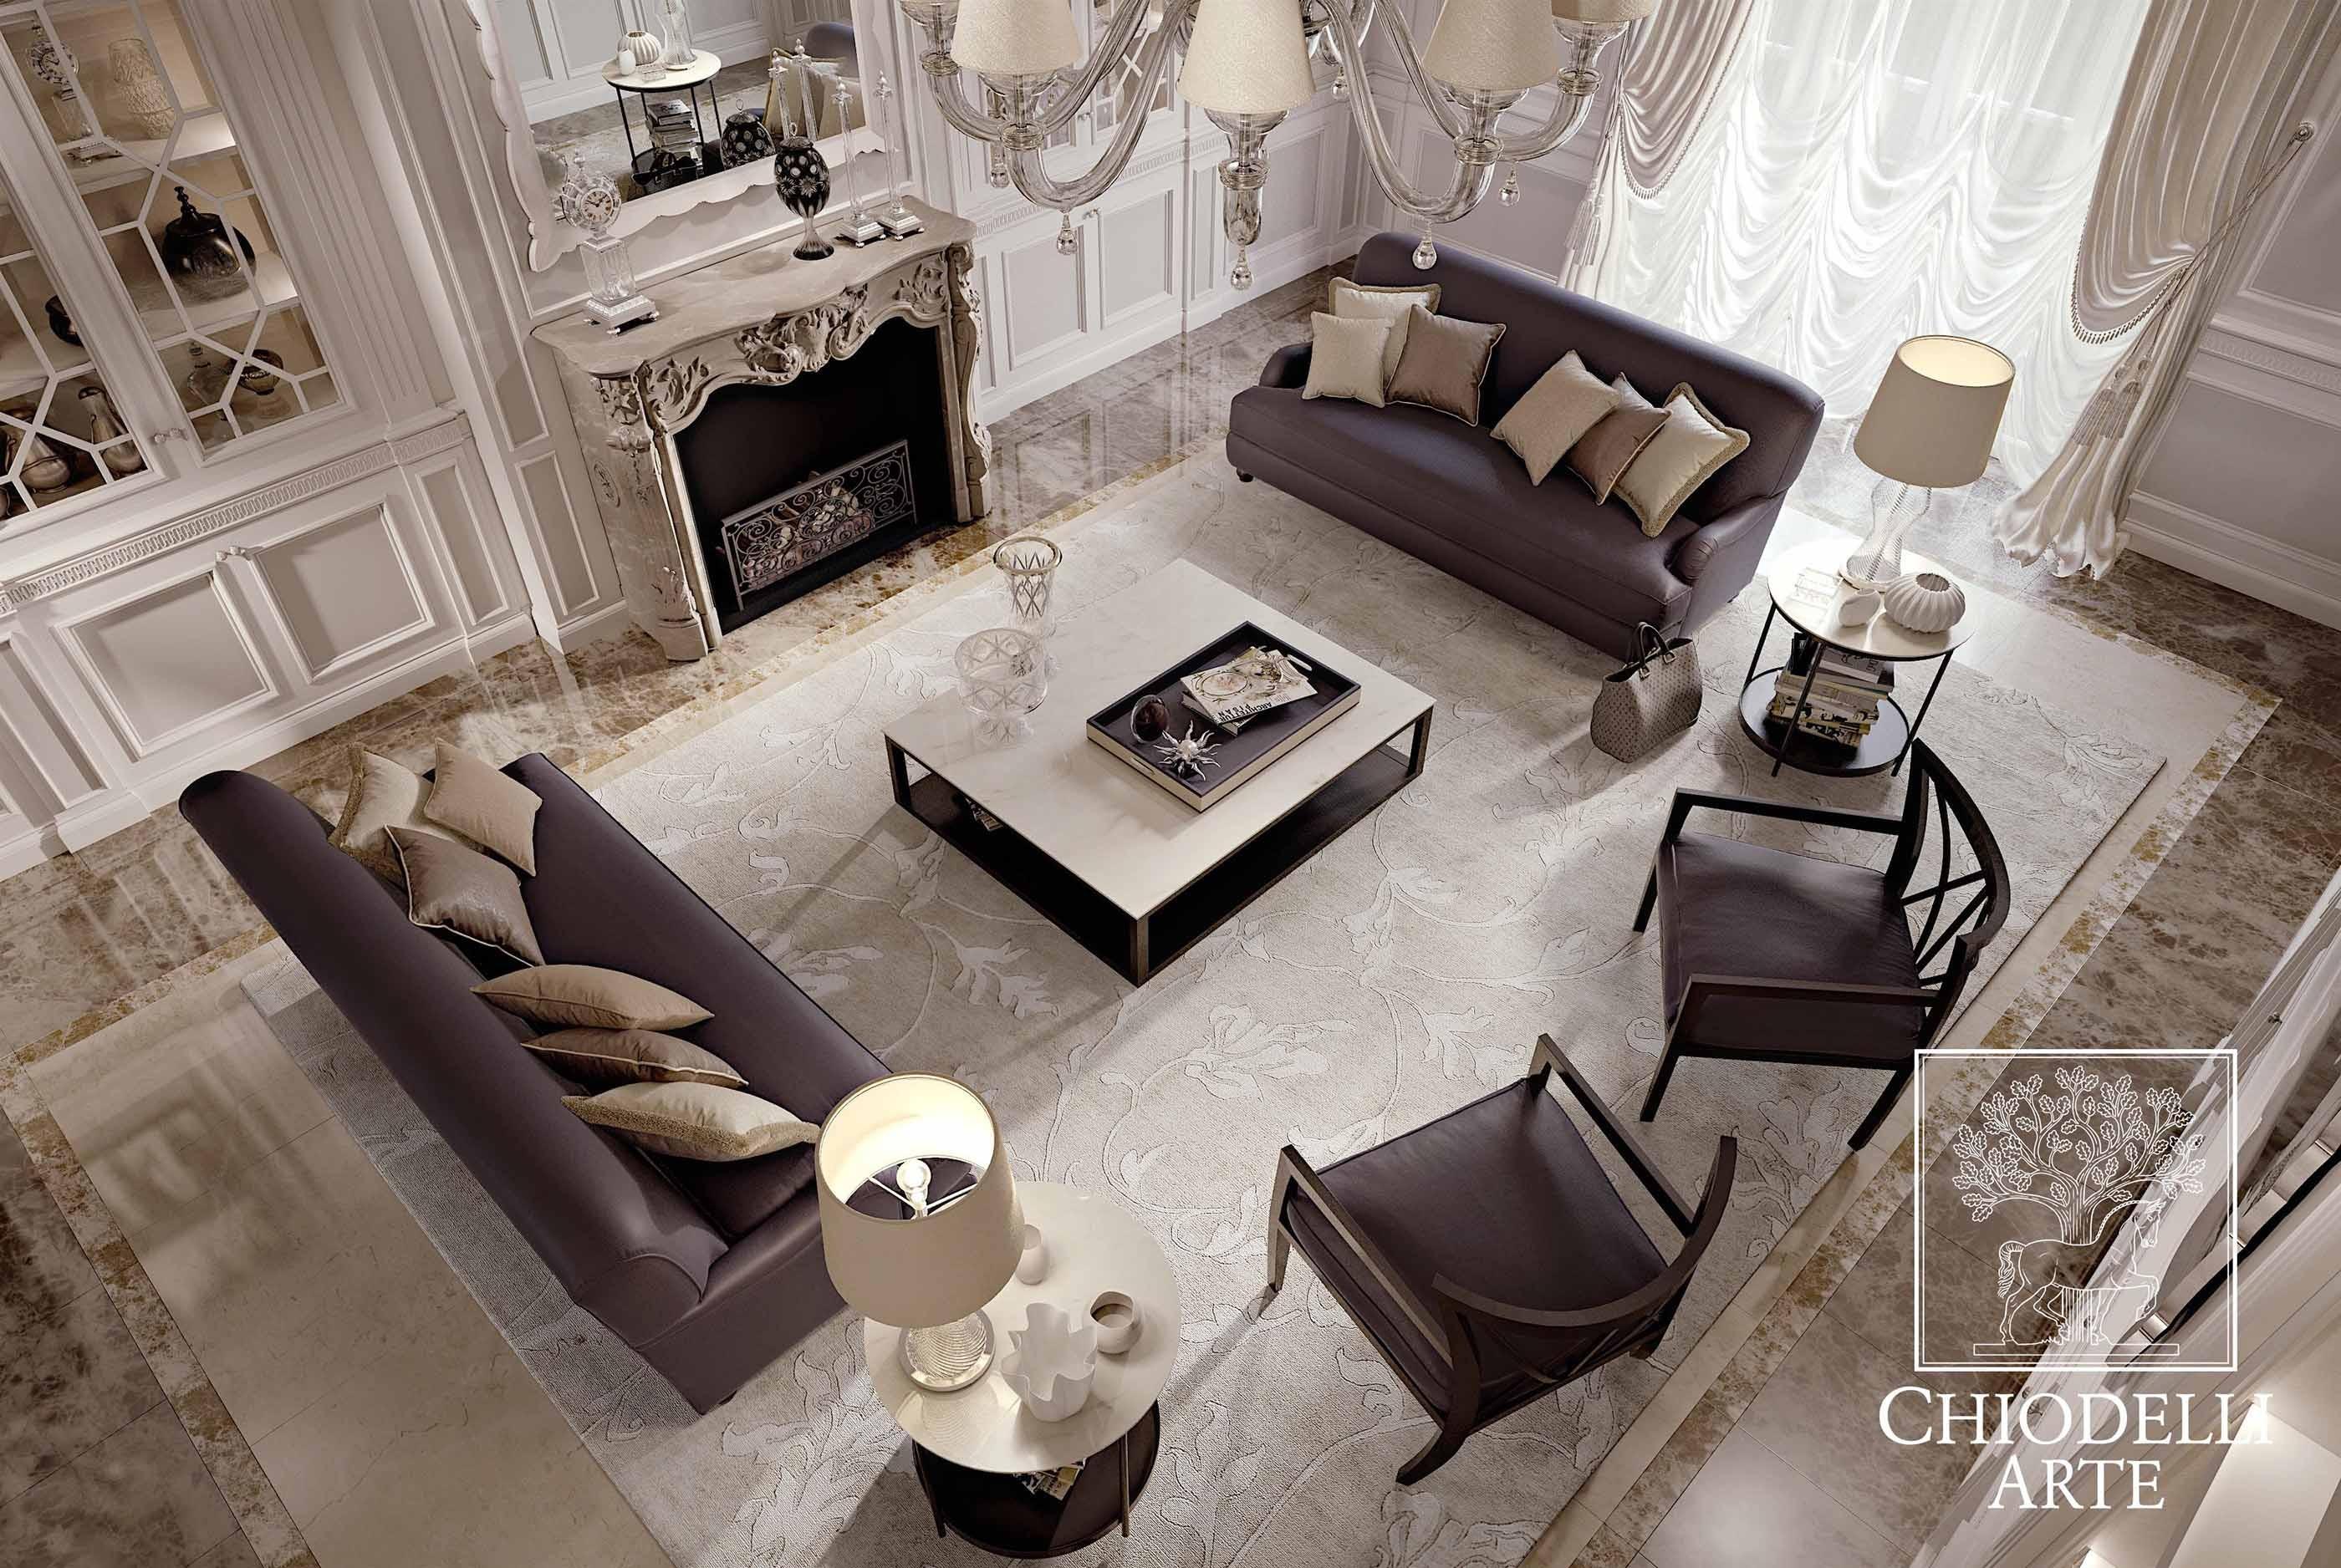 Geometric lines and contrasts - طراحی داخلی